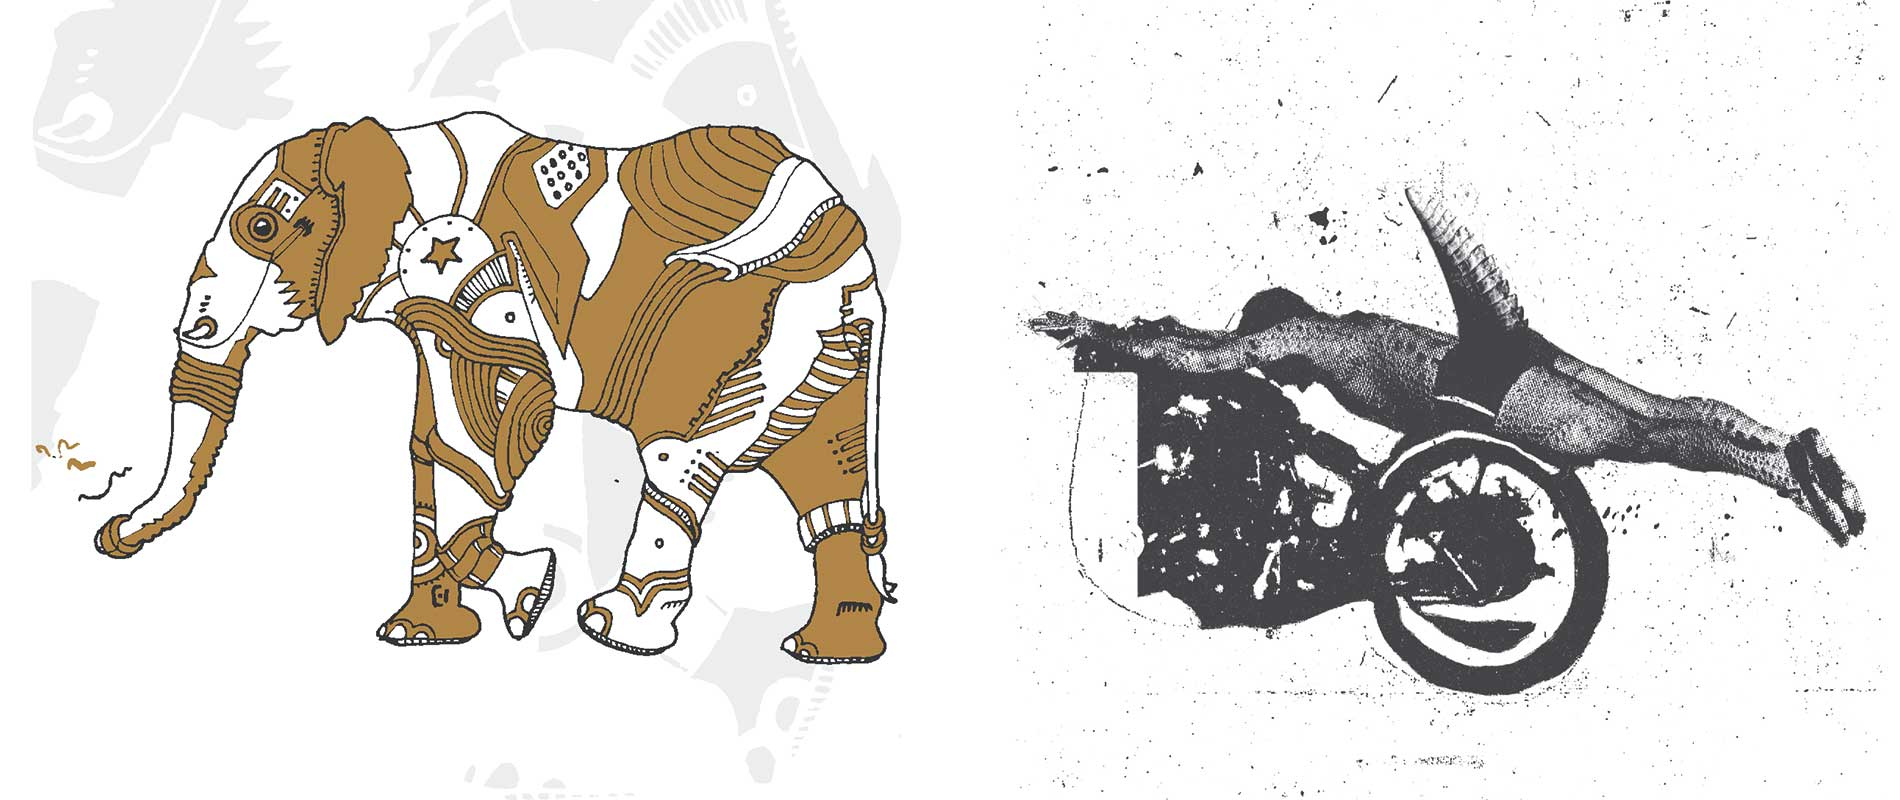 Animal Collective Fupete Jack la Motta 36 Chambers Drago